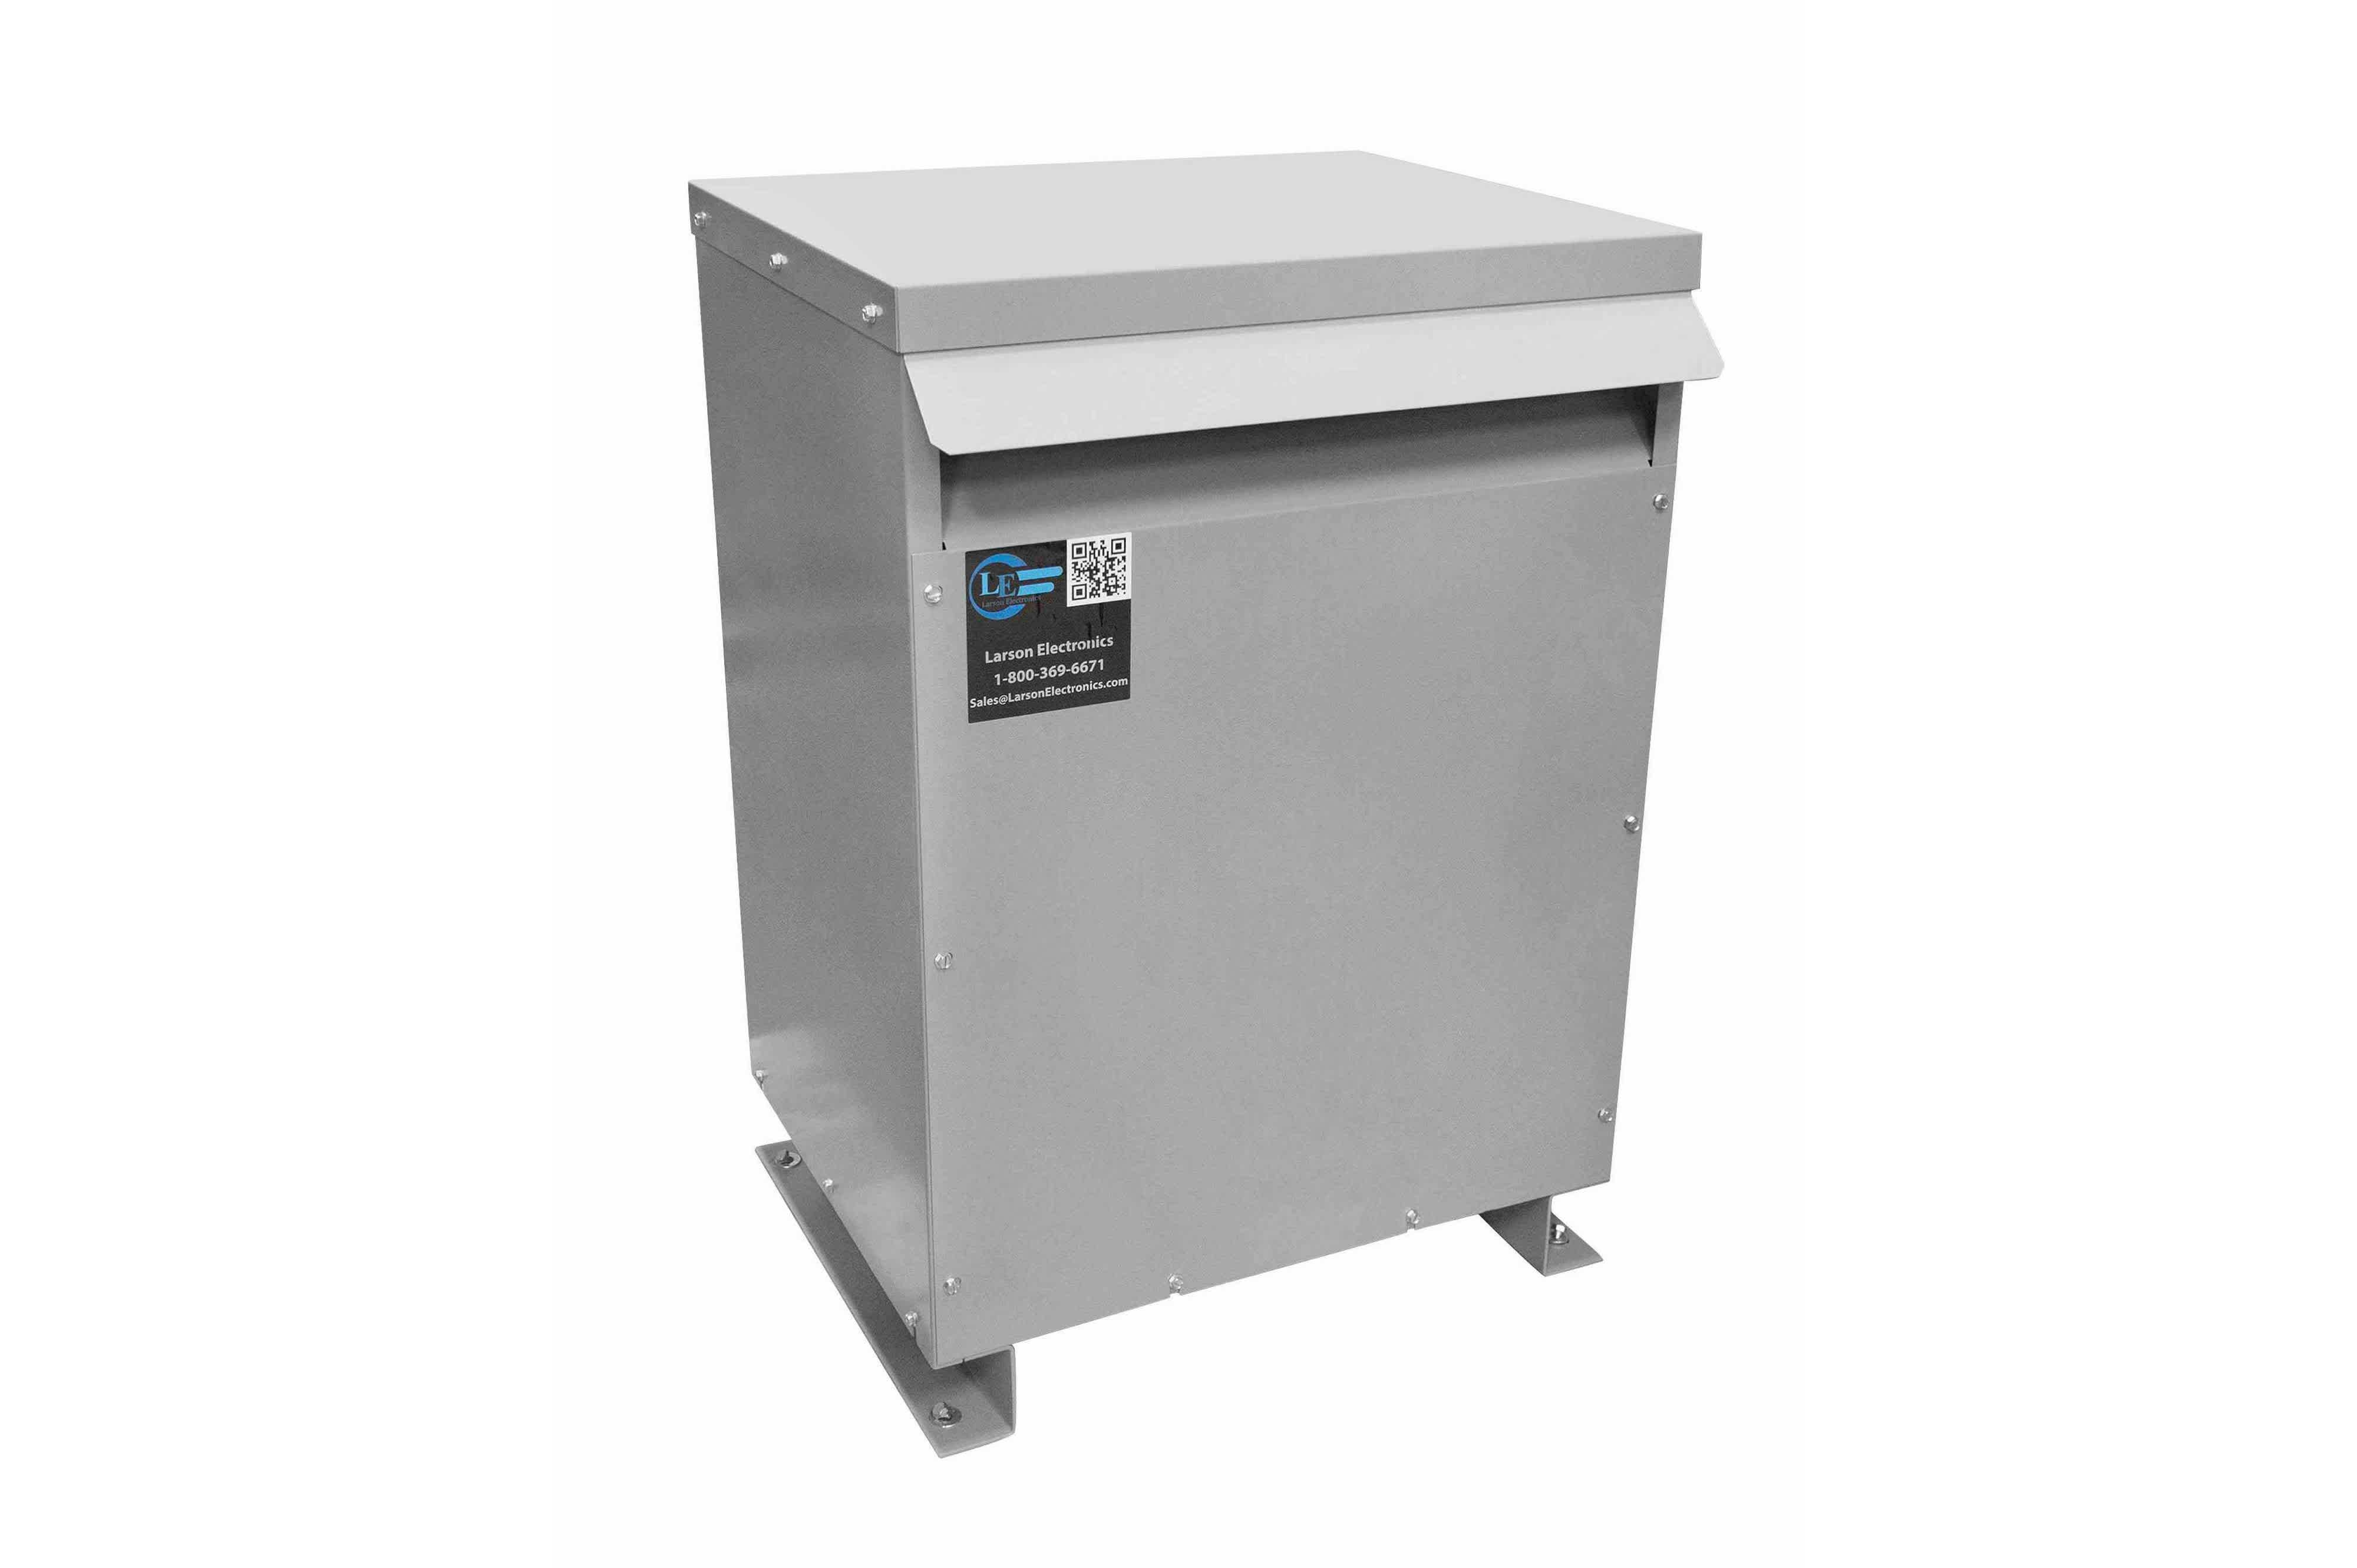 45 kVA 3PH Isolation Transformer, 480V Wye Primary, 240V/120 Delta Secondary, N3R, Ventilated, 60 Hz